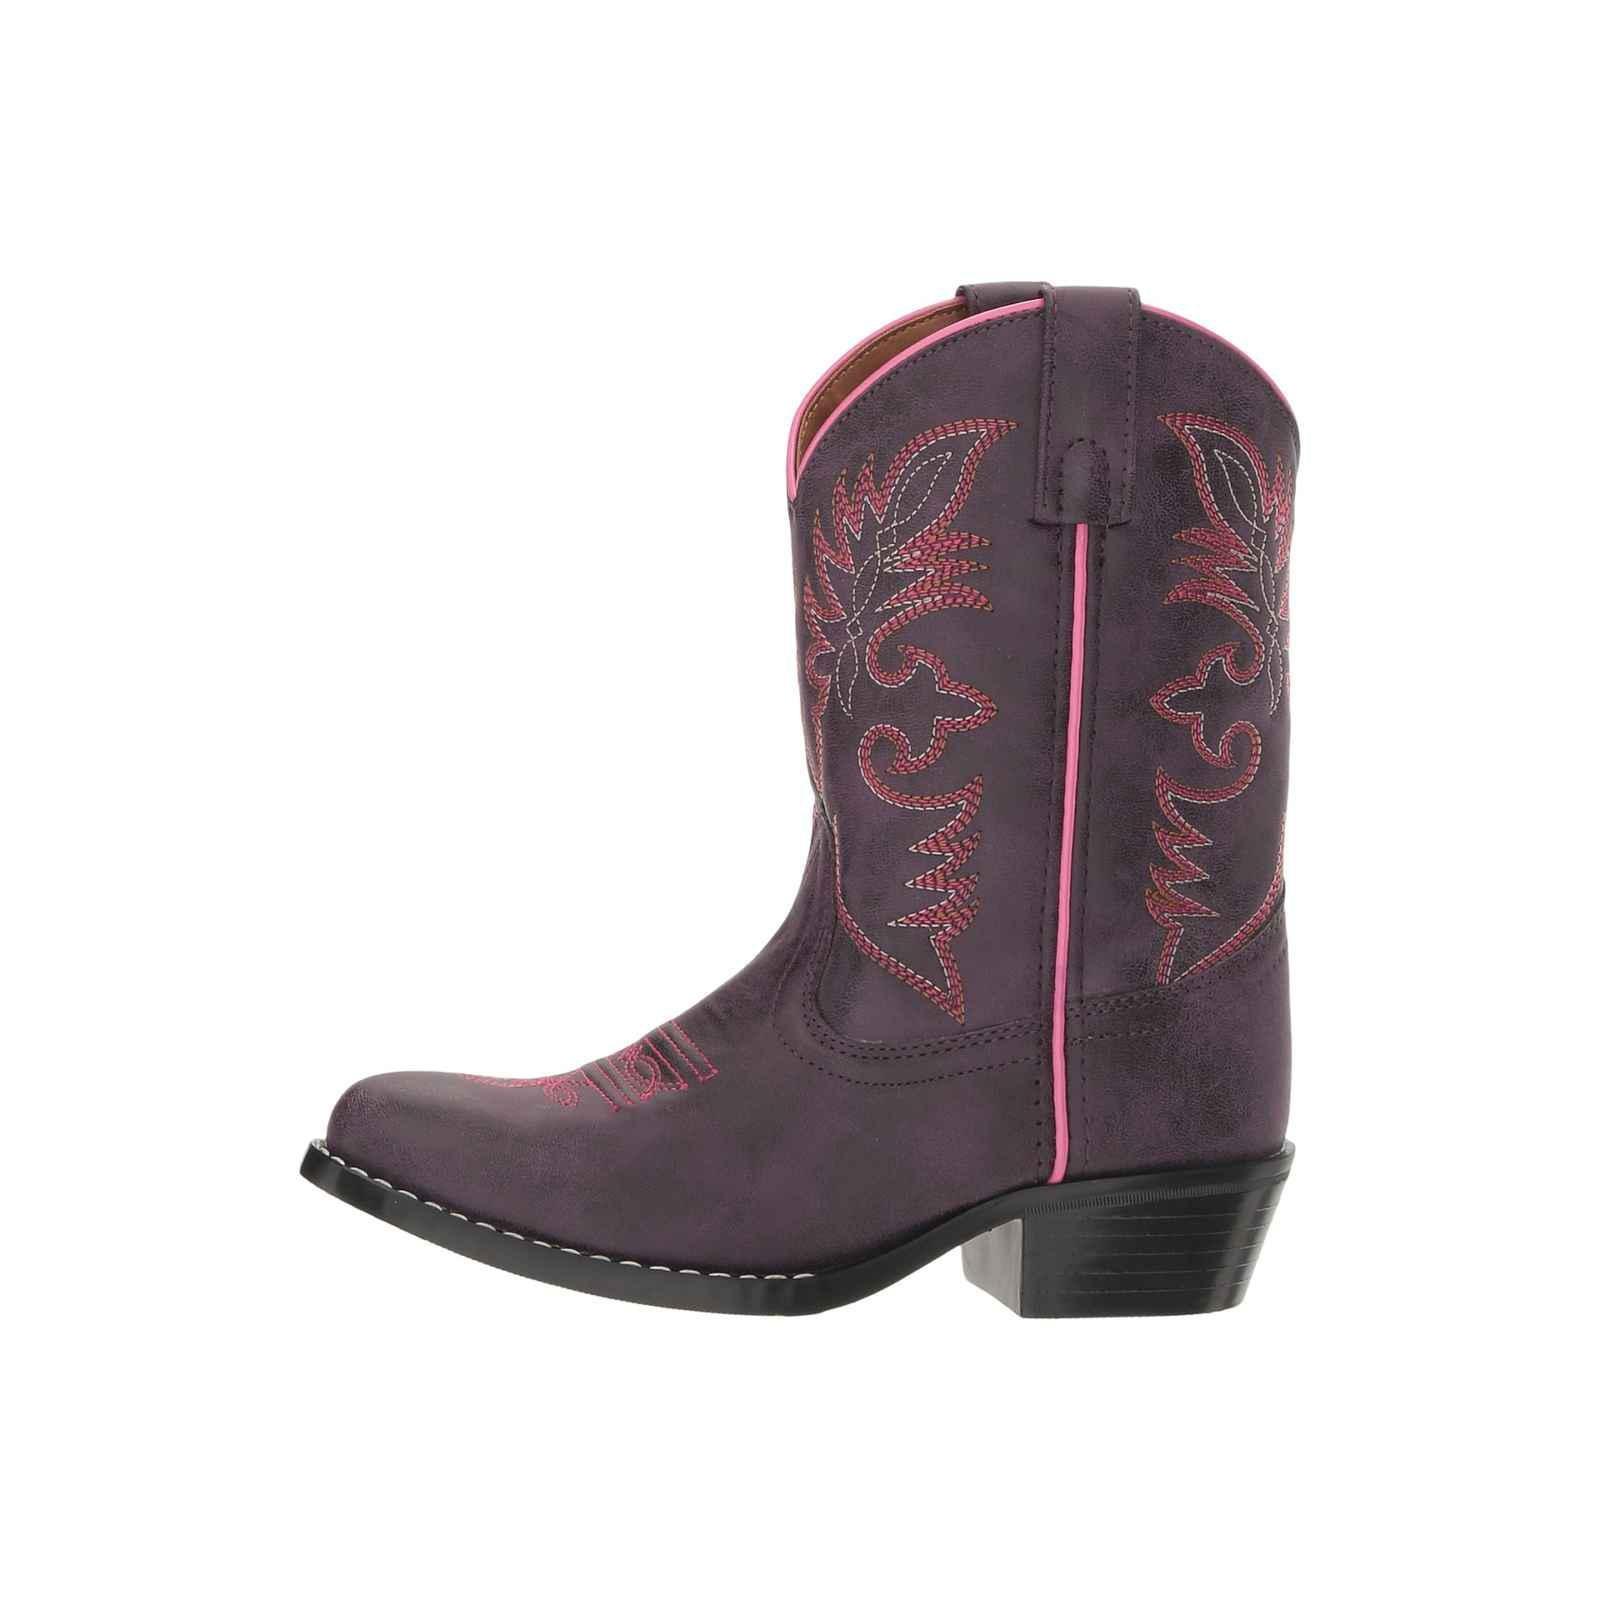 Laredo Western Boots Girls Leather Straps 11 Child Purple LC2457